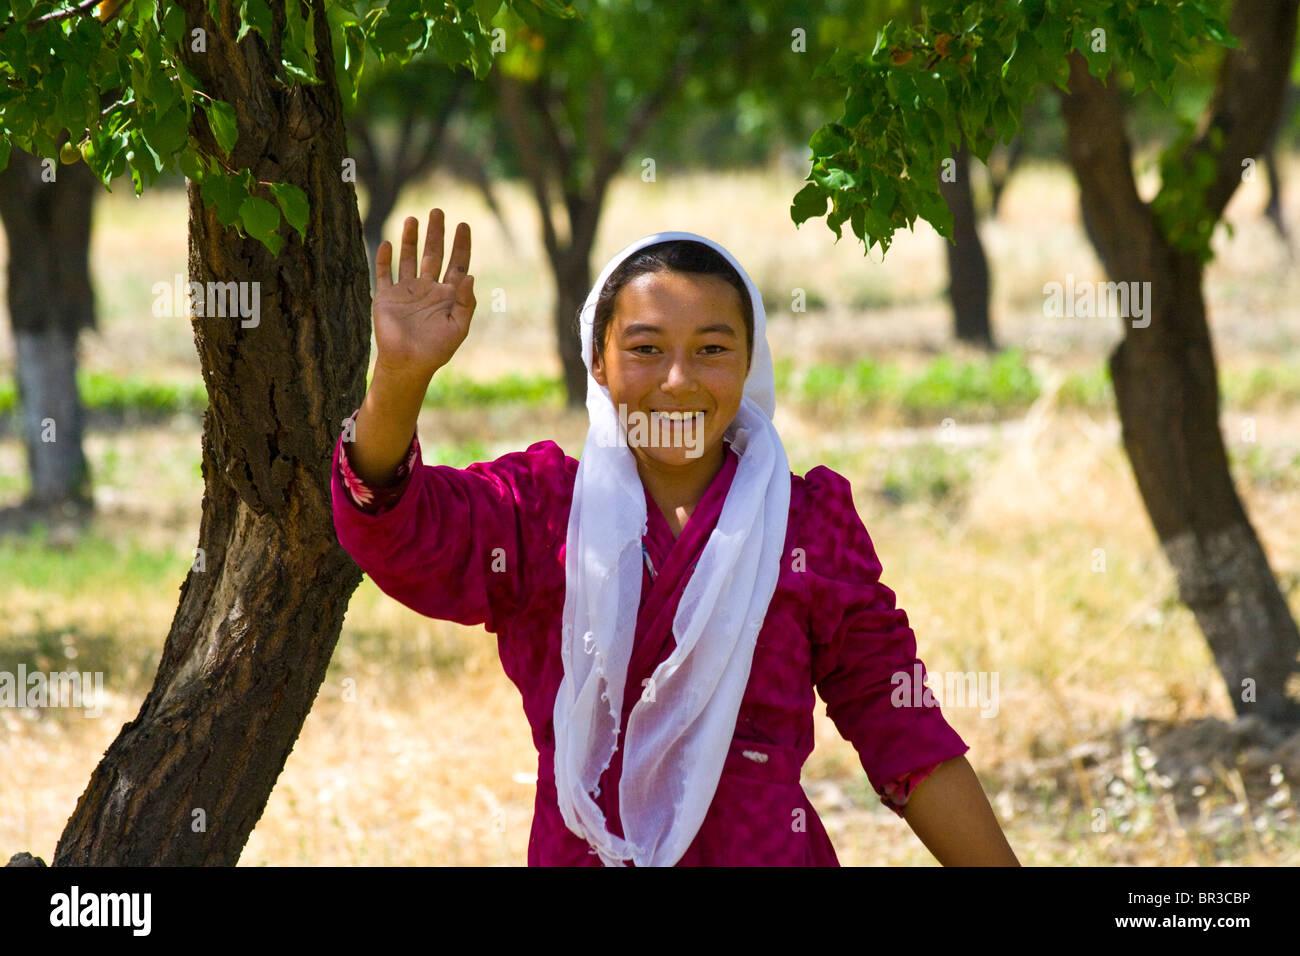 frauen ab 18 jahren nackt usbekistan young teen